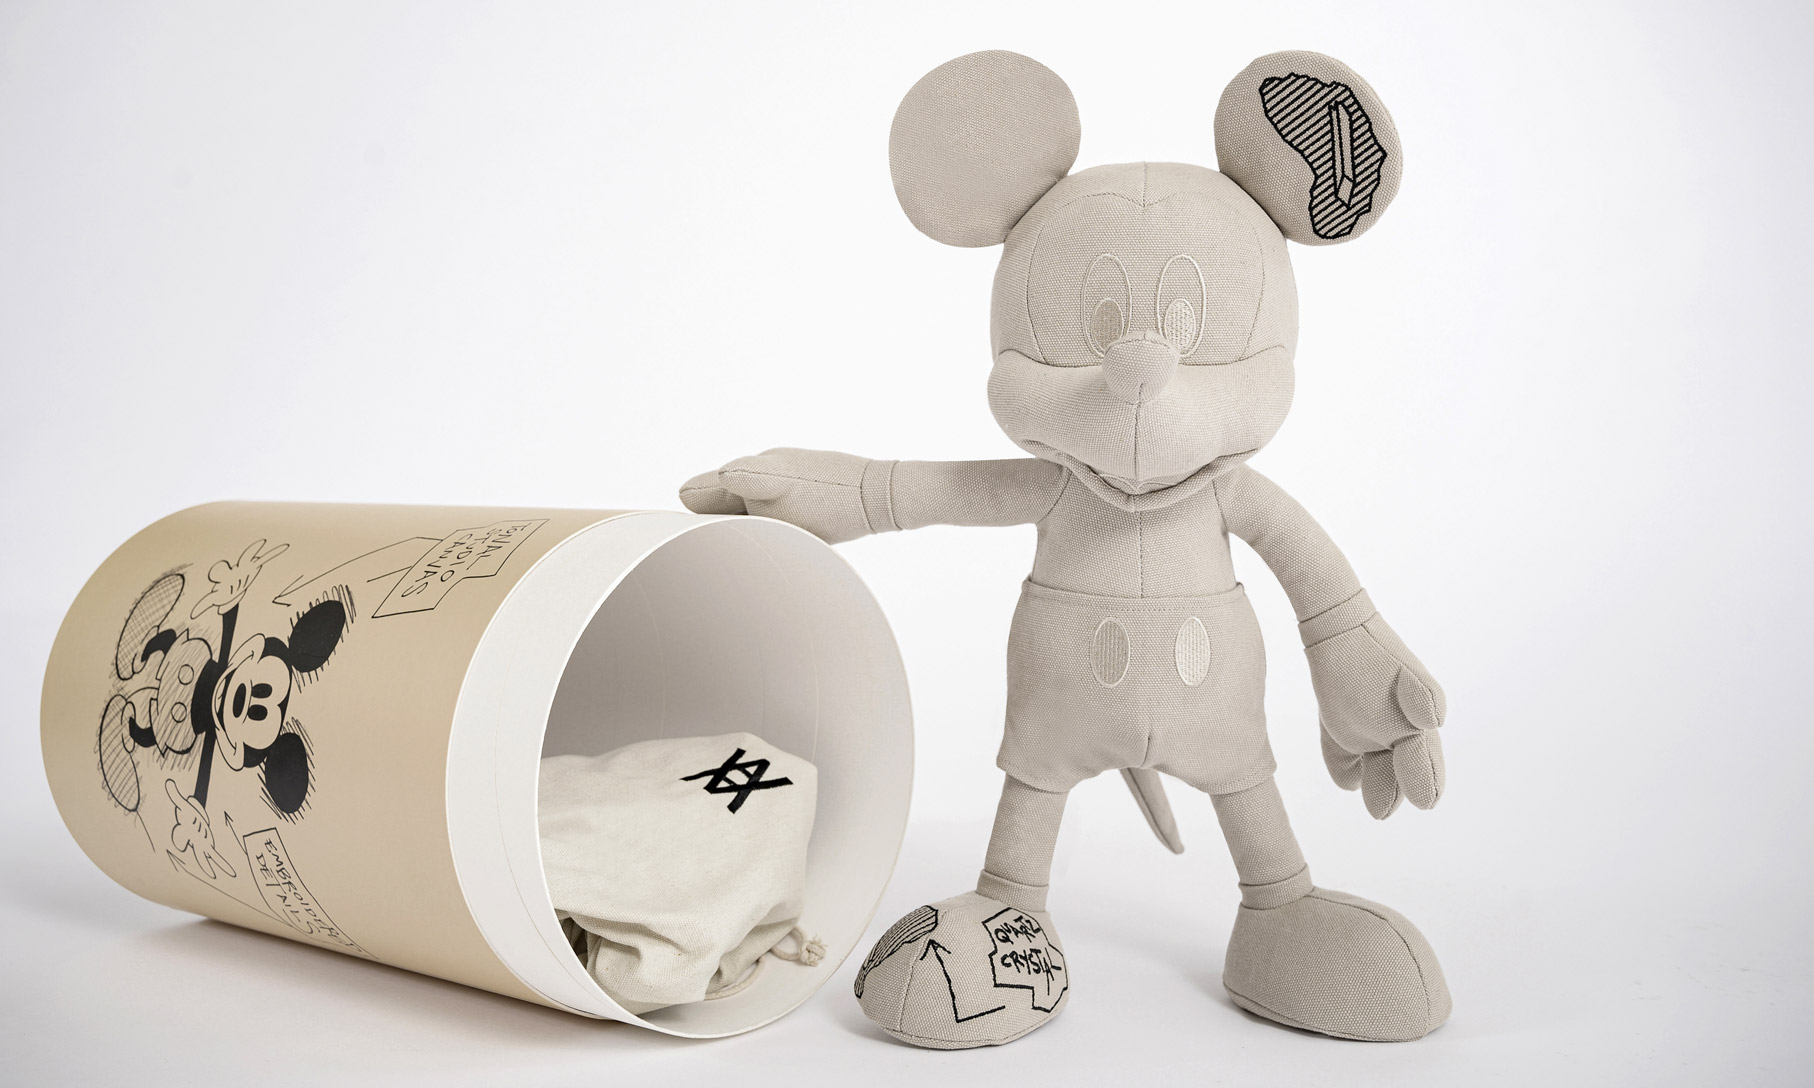 INNERSECT 首发,Disney x Daniel Arsham x APPortfolio 三方联乘系列释出